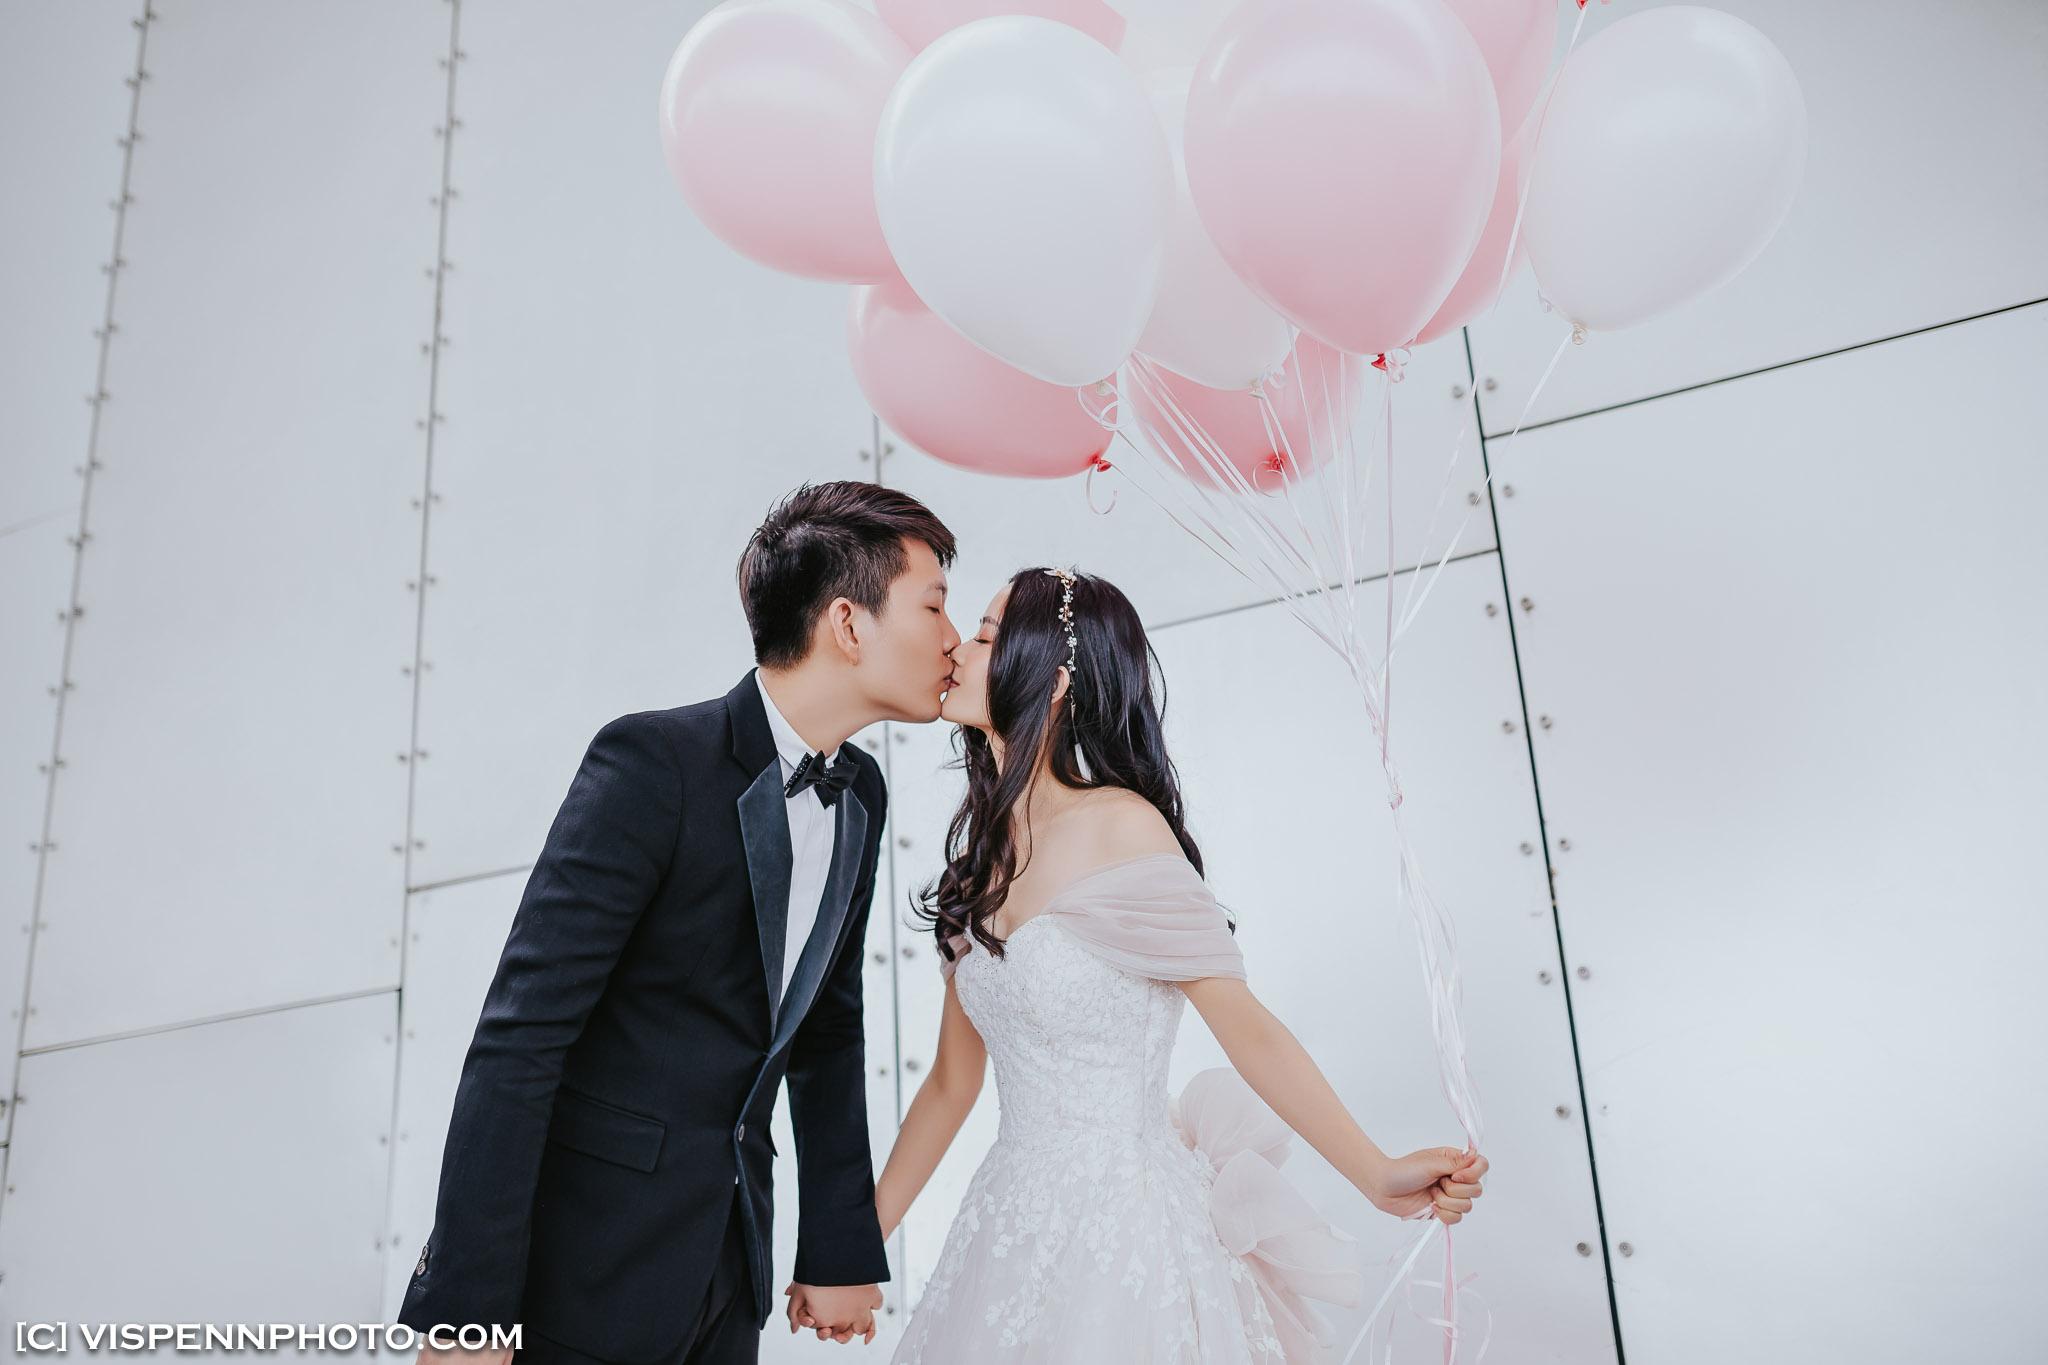 PRE WEDDING Photography Melbourne VISPENN 墨尔本 婚纱照 结婚照 婚纱摄影 VISPENN P5D4 1778